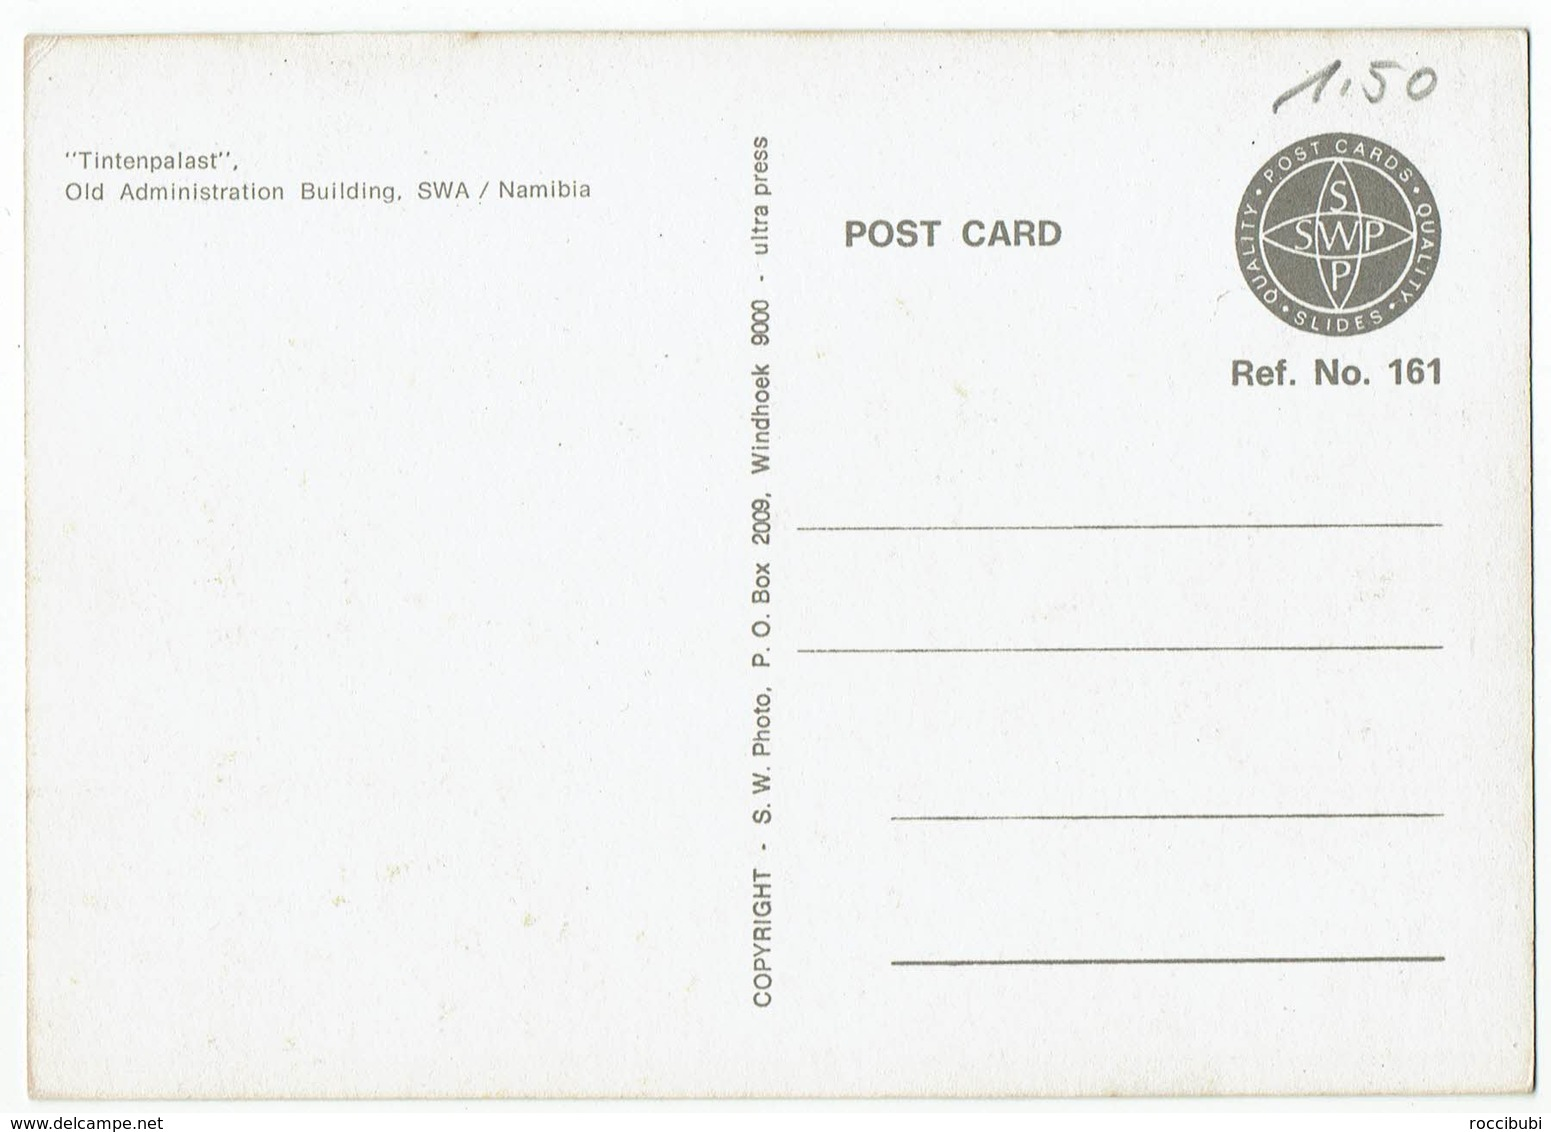 (032..899) Nambia, Windhoek S.W.A., Tintenpalast - Namibie